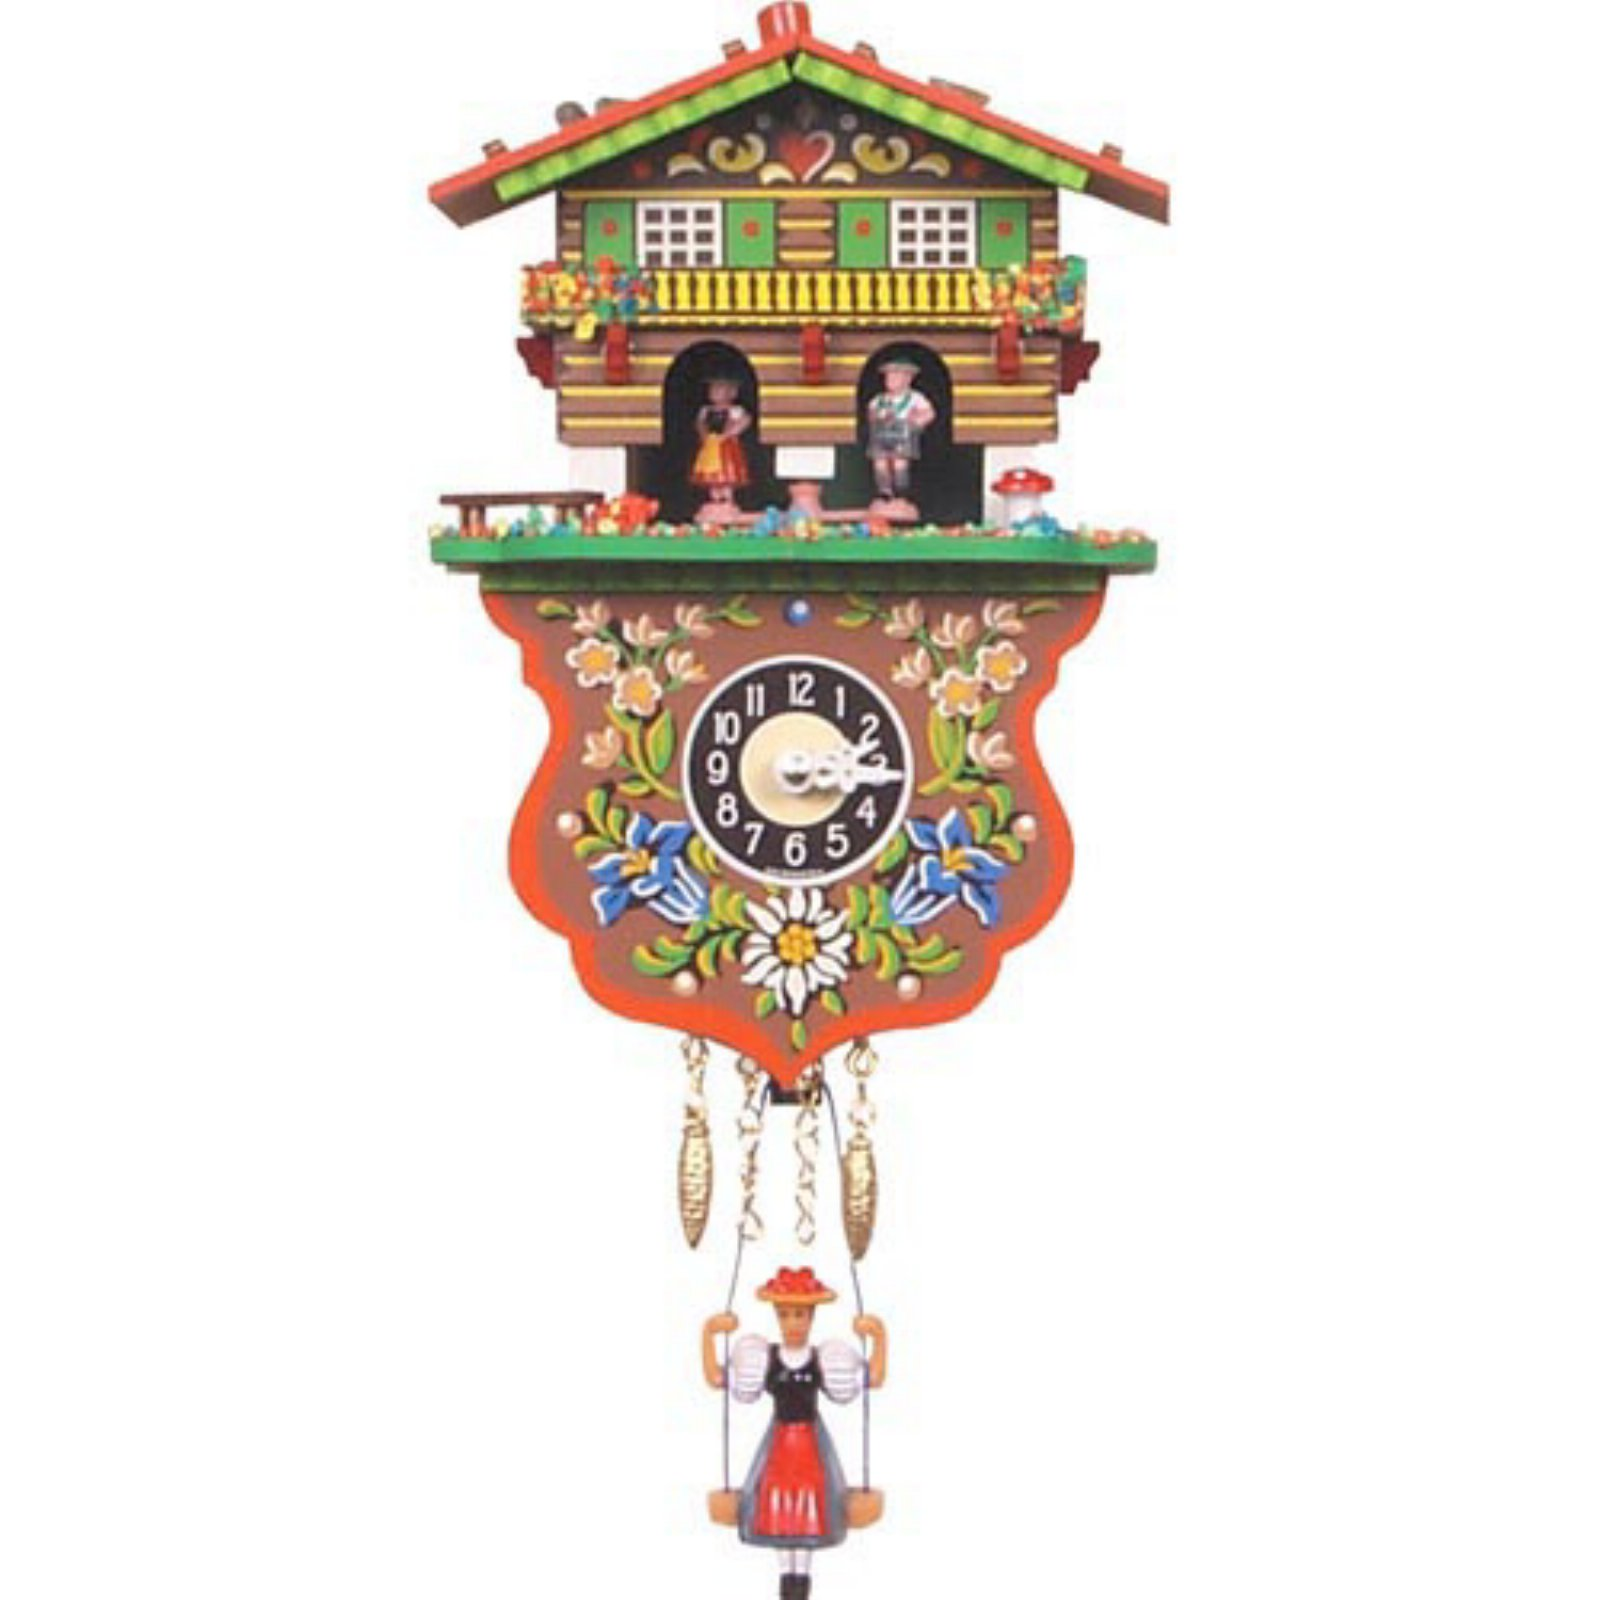 Boy and Girl Weather House Cuckoo Clock